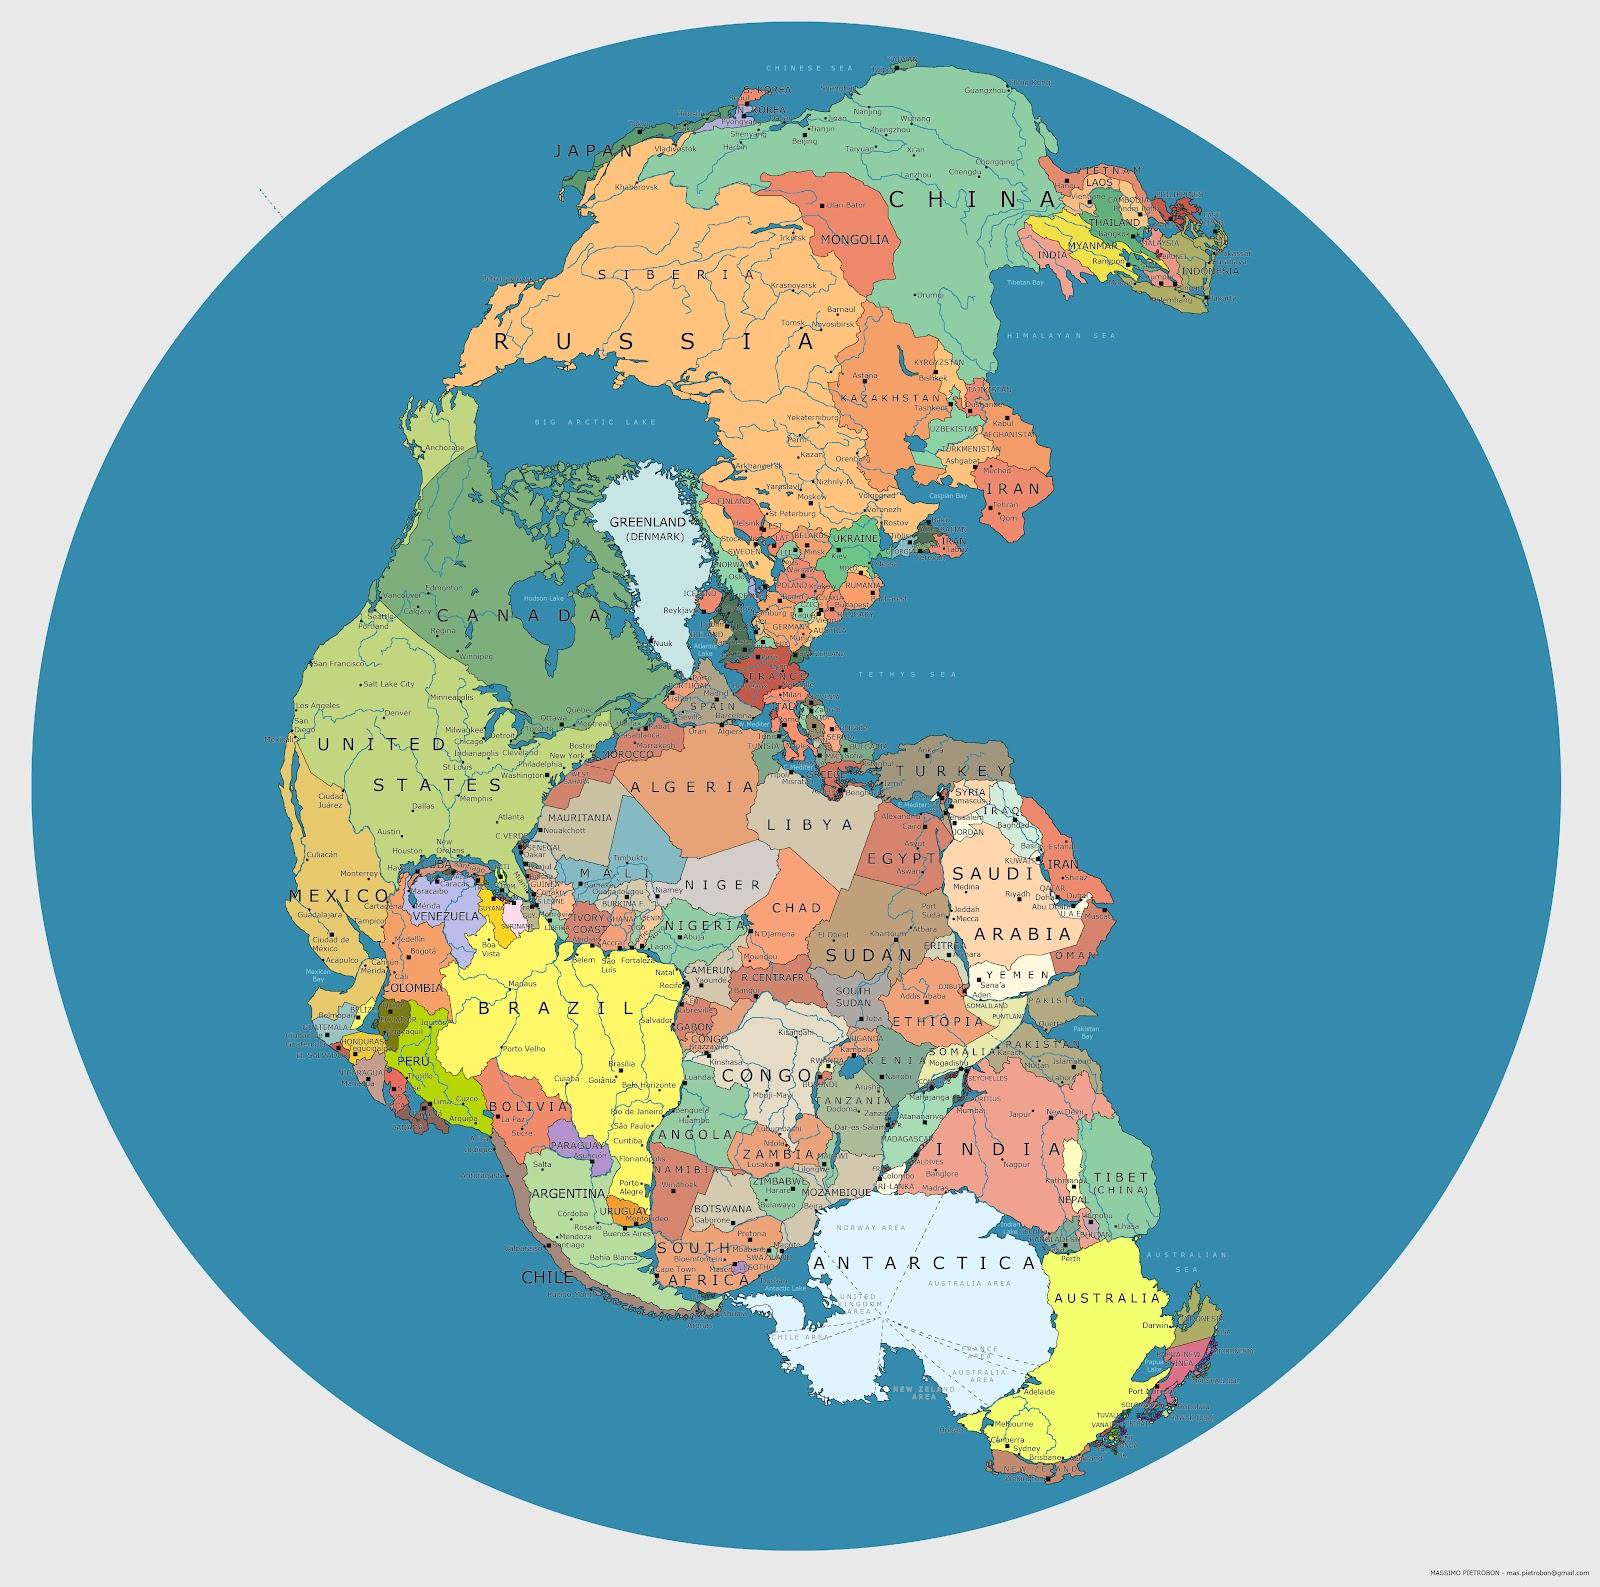 continent pangea සඳහා පින්තුර ප්රතිඵල